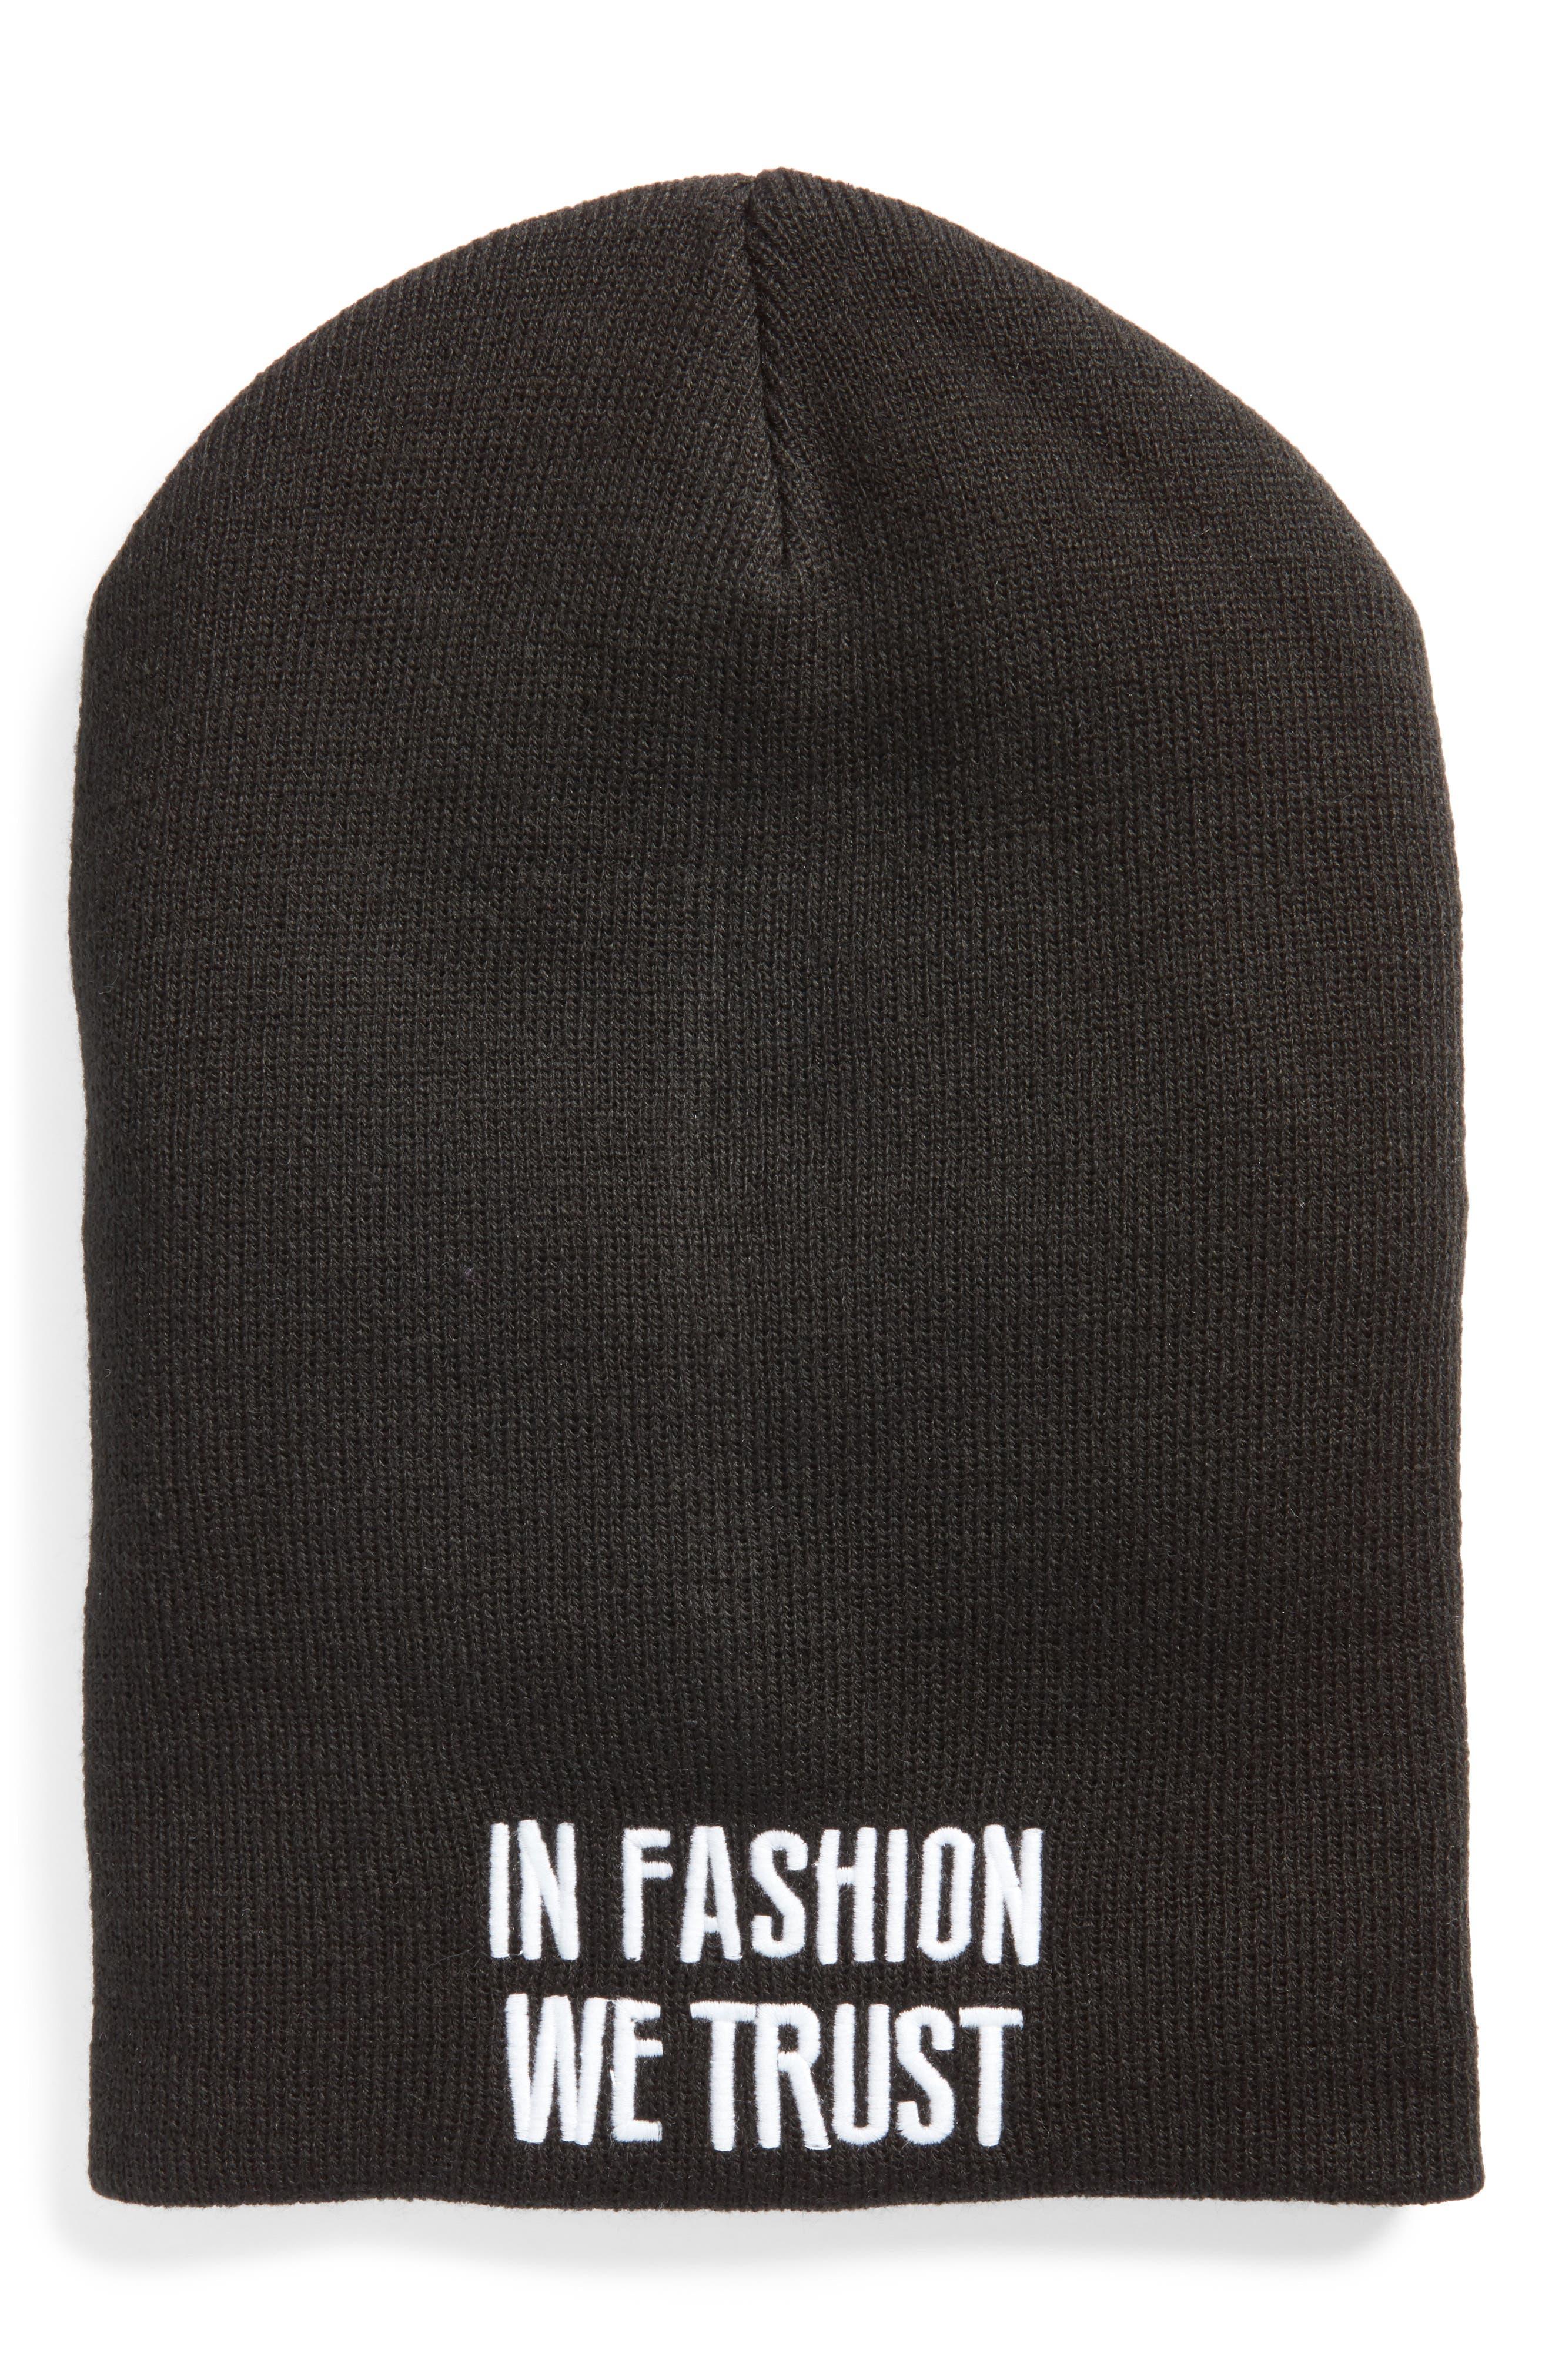 In Fashion We Trust Beanie,                             Main thumbnail 1, color,                             Black